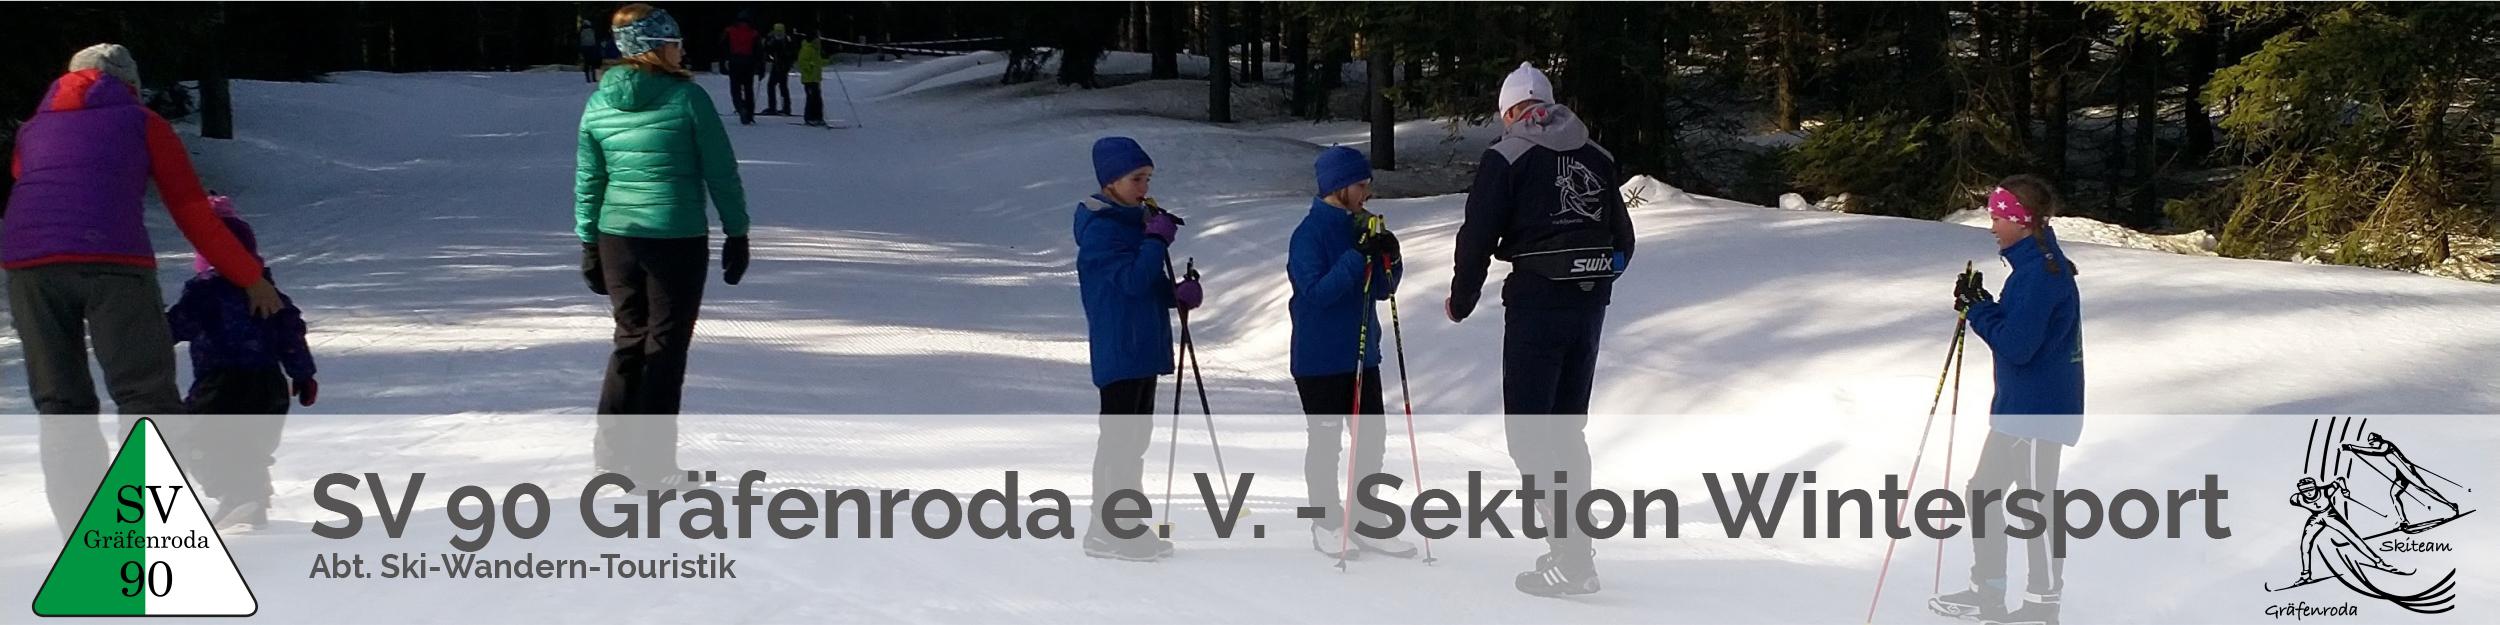 SV 90 Gräfenroda e.V. – Sektion Wintersport